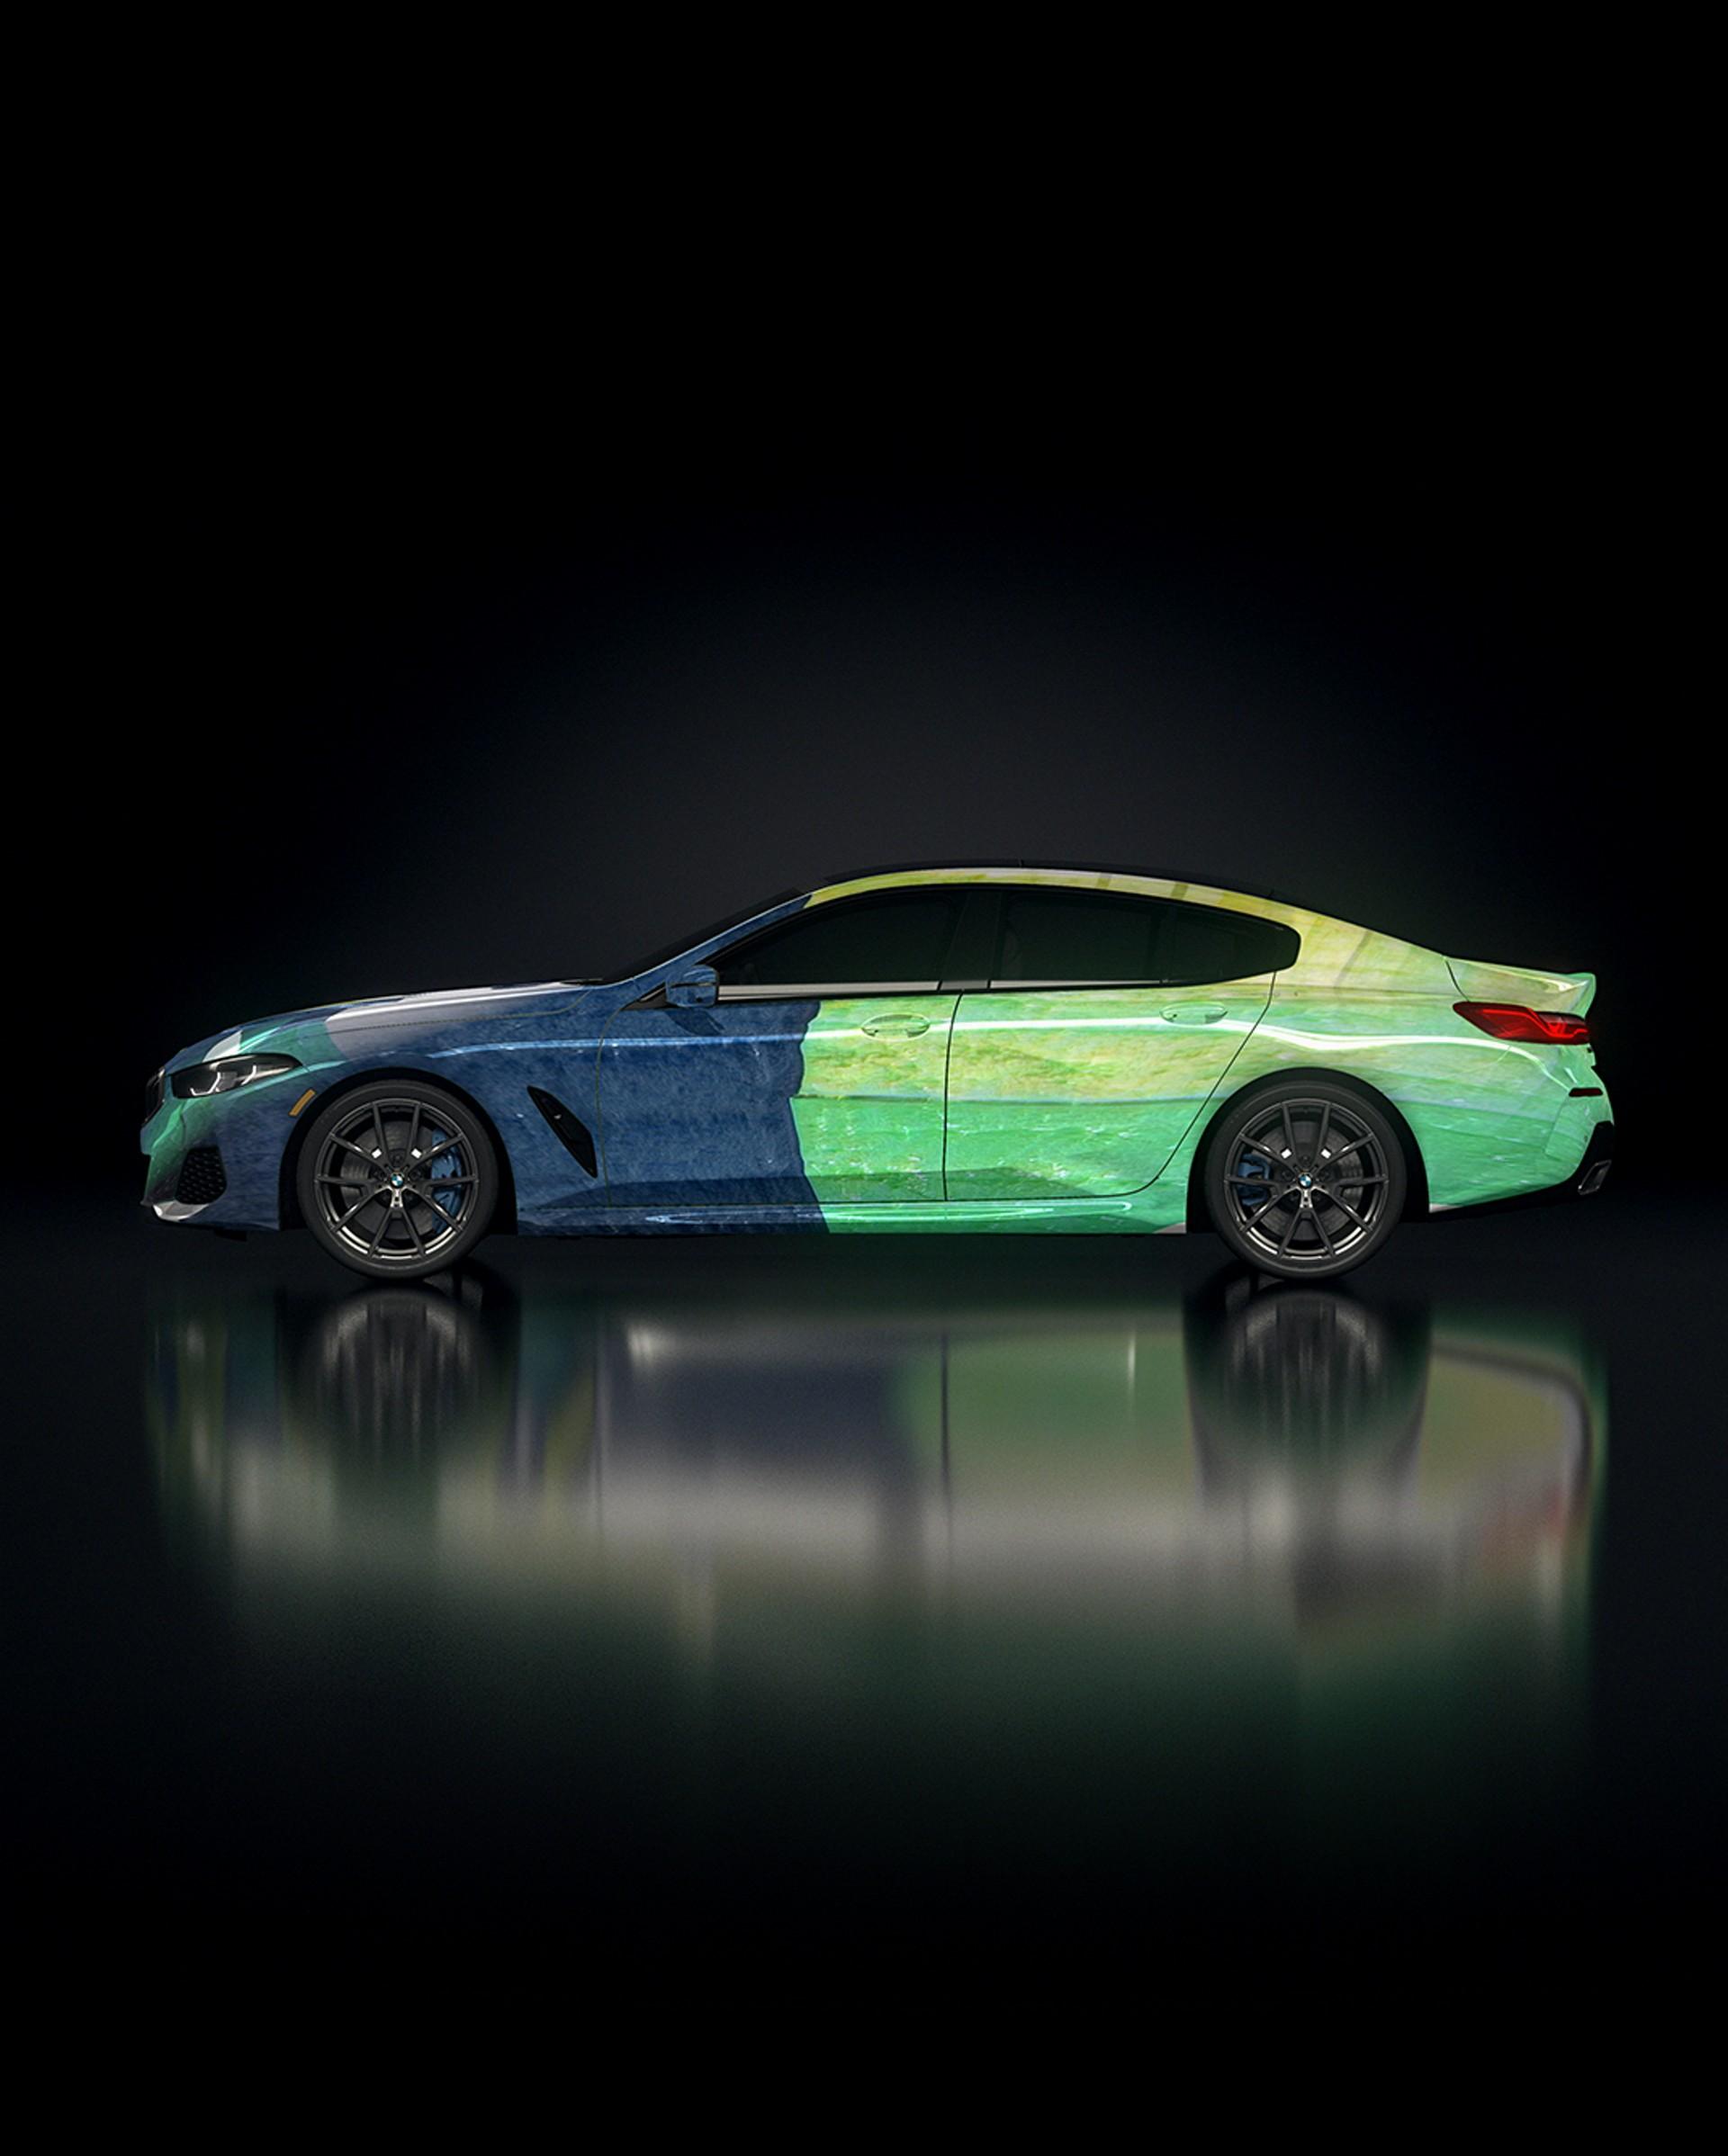 BMW-8-Series-Gran-Coupe-art-car-16